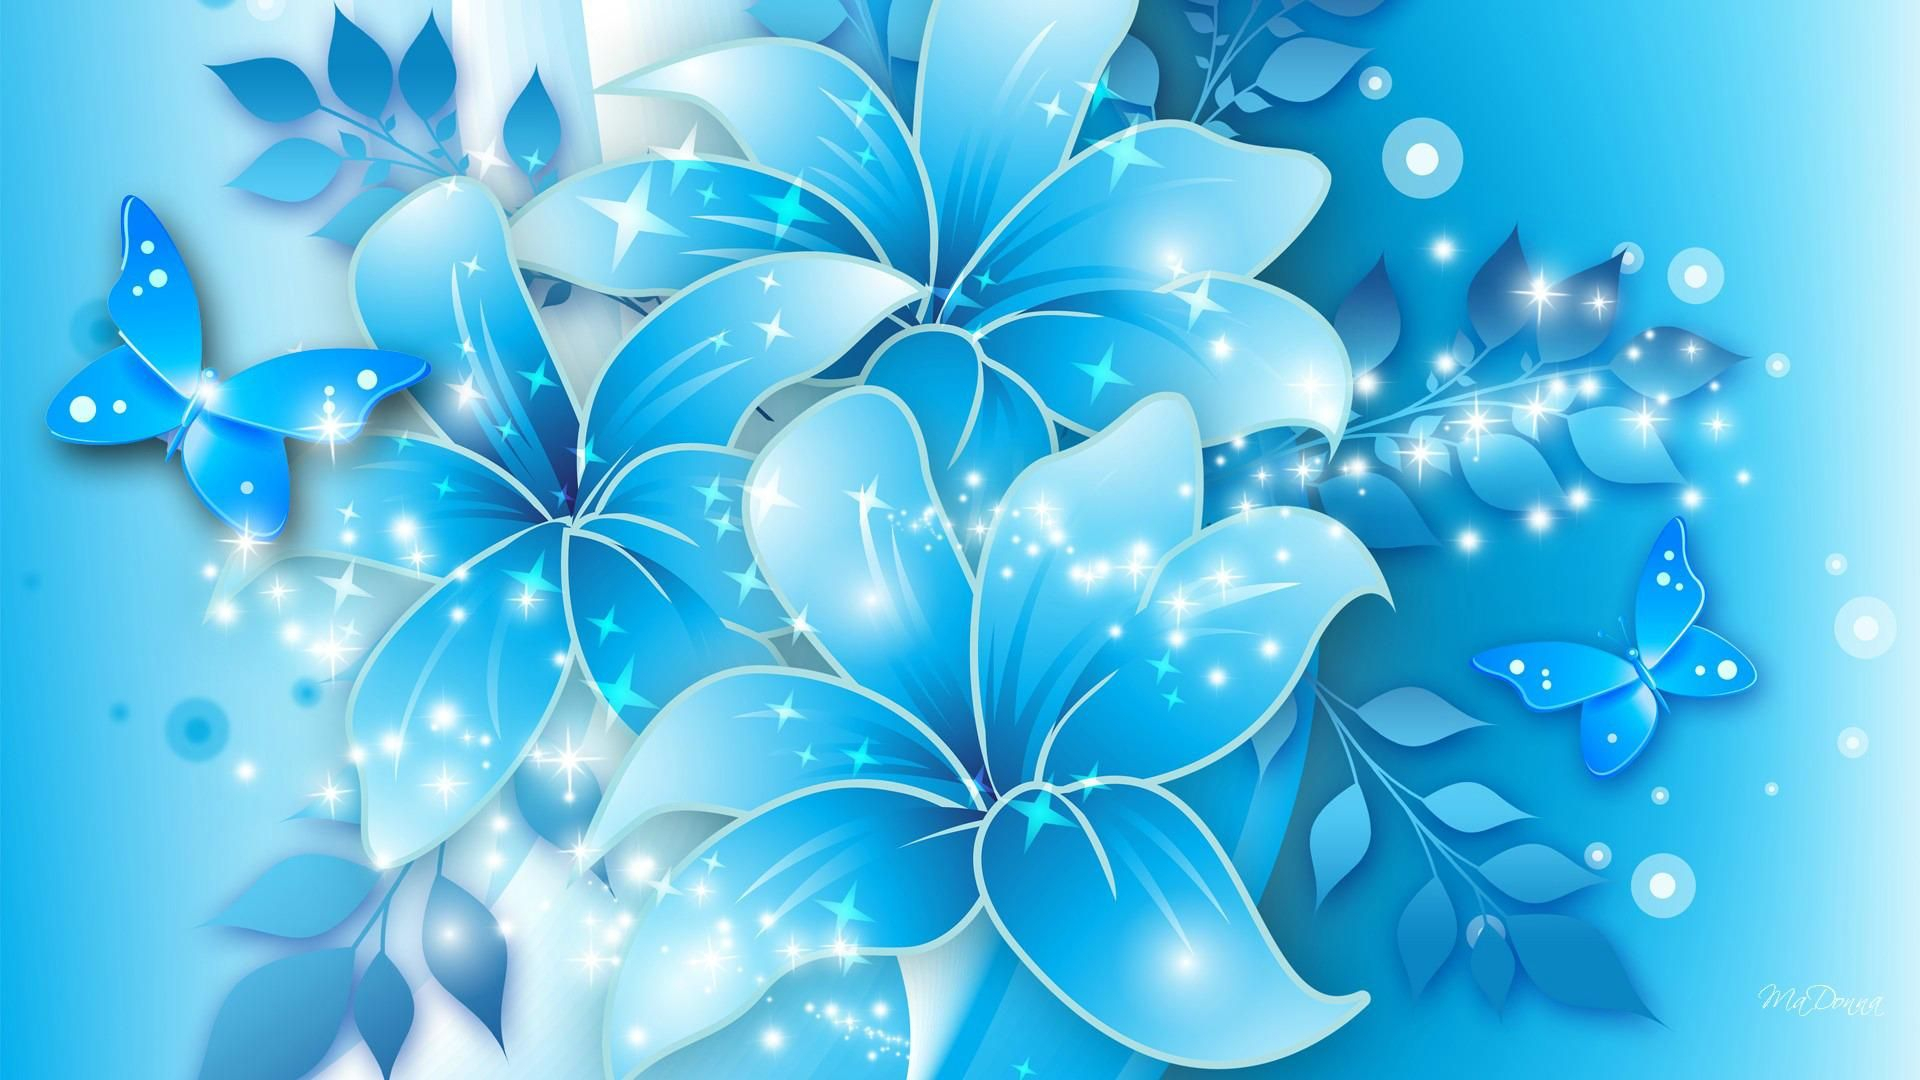 pinbrenda dunaway on blue flowers are beautiful in 2019 | blue